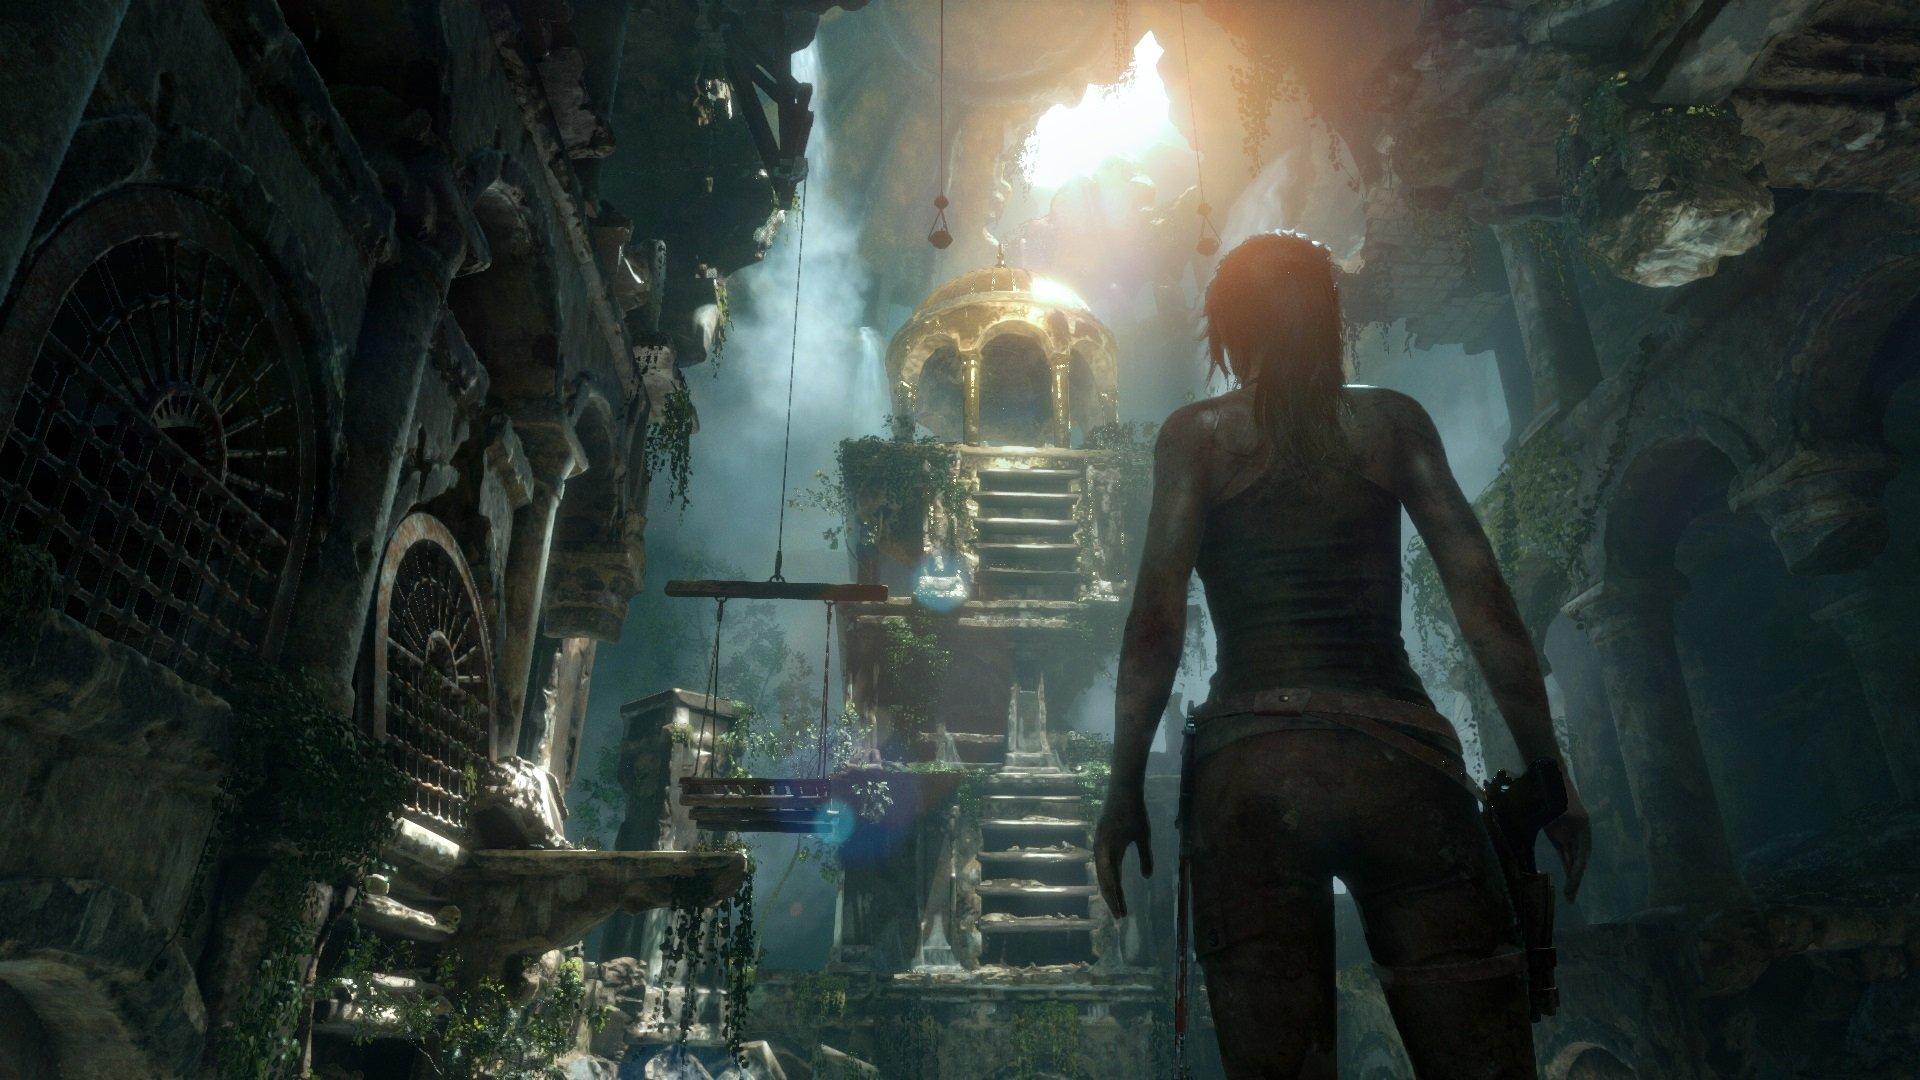 Rise Of The Tomb Rider: 20 Aniversario: Amazon.es: Videojuegos